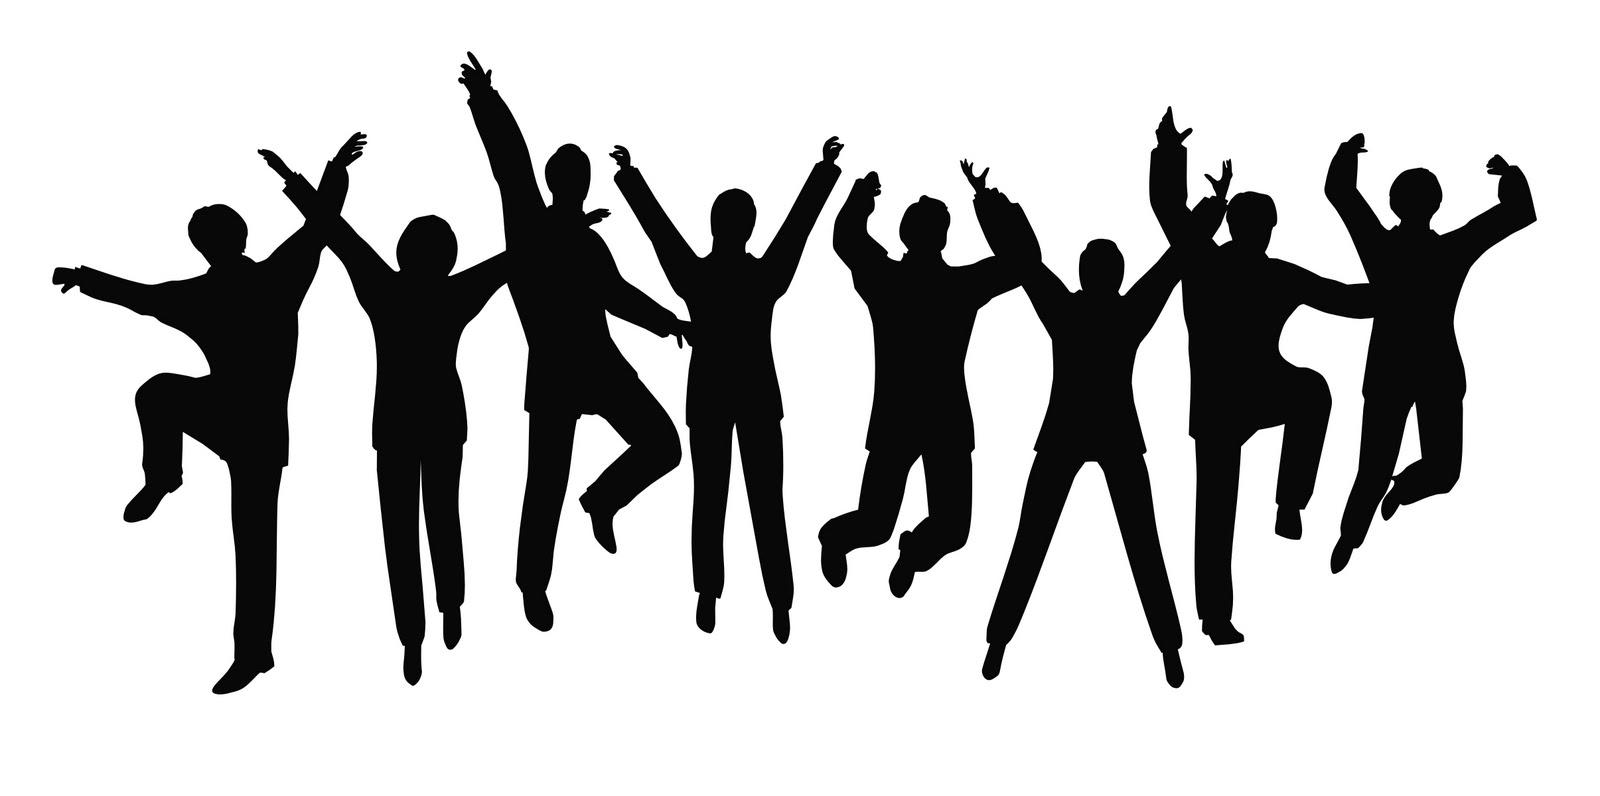 Club clipart group dancing Dance art clipartix 4 clipart